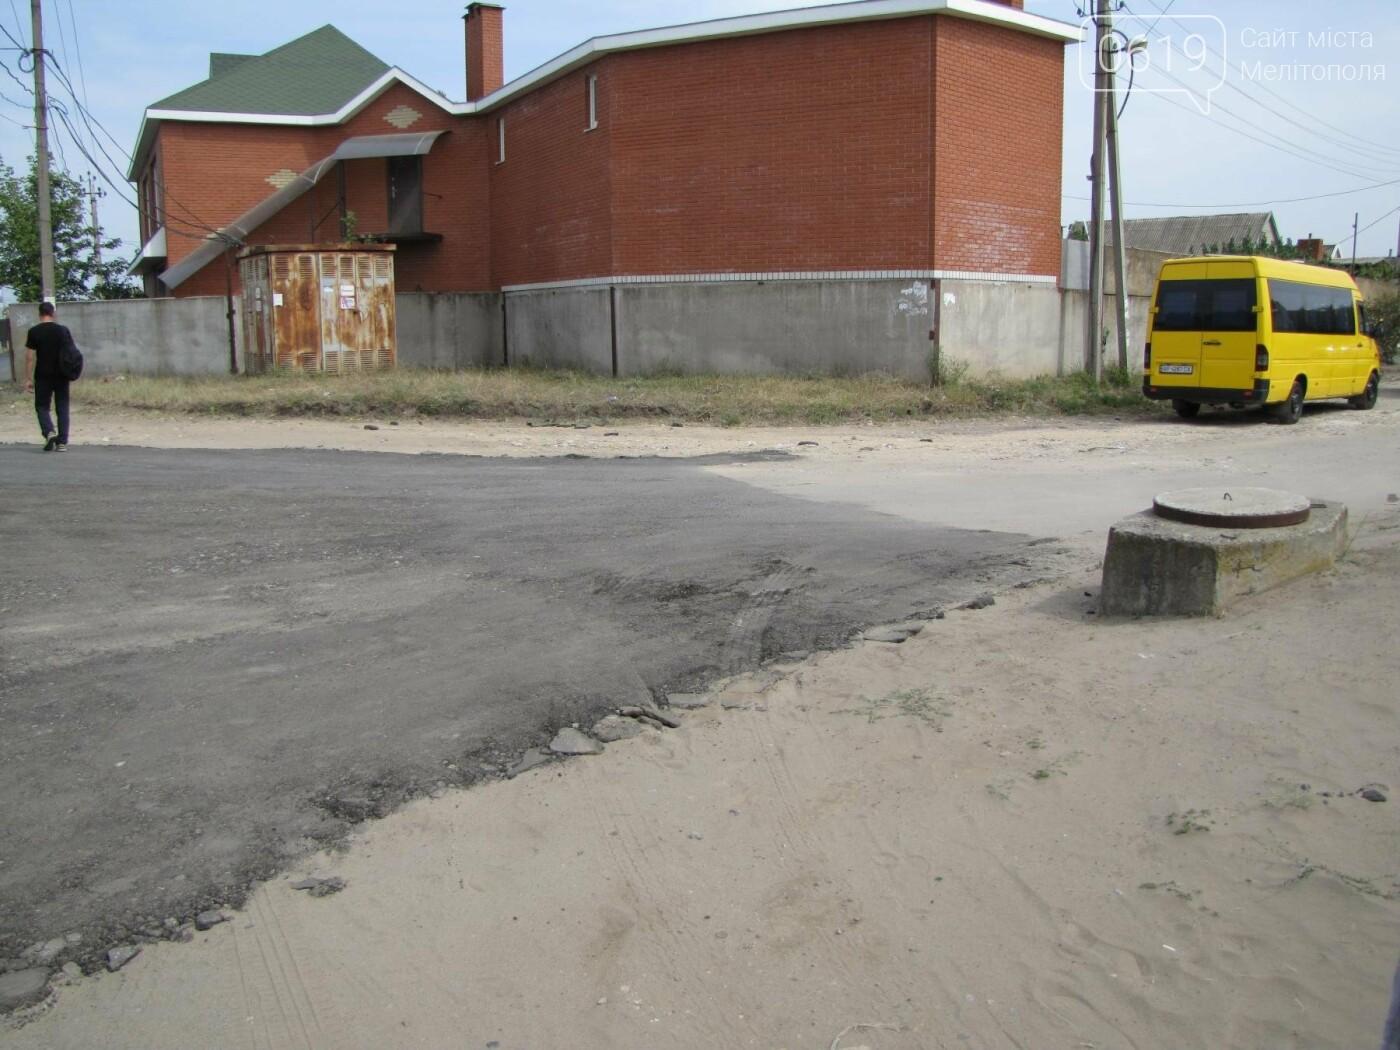 В Мелитополе отремонтировали дорогу на окраине, фото-4, Фото сайта 0619